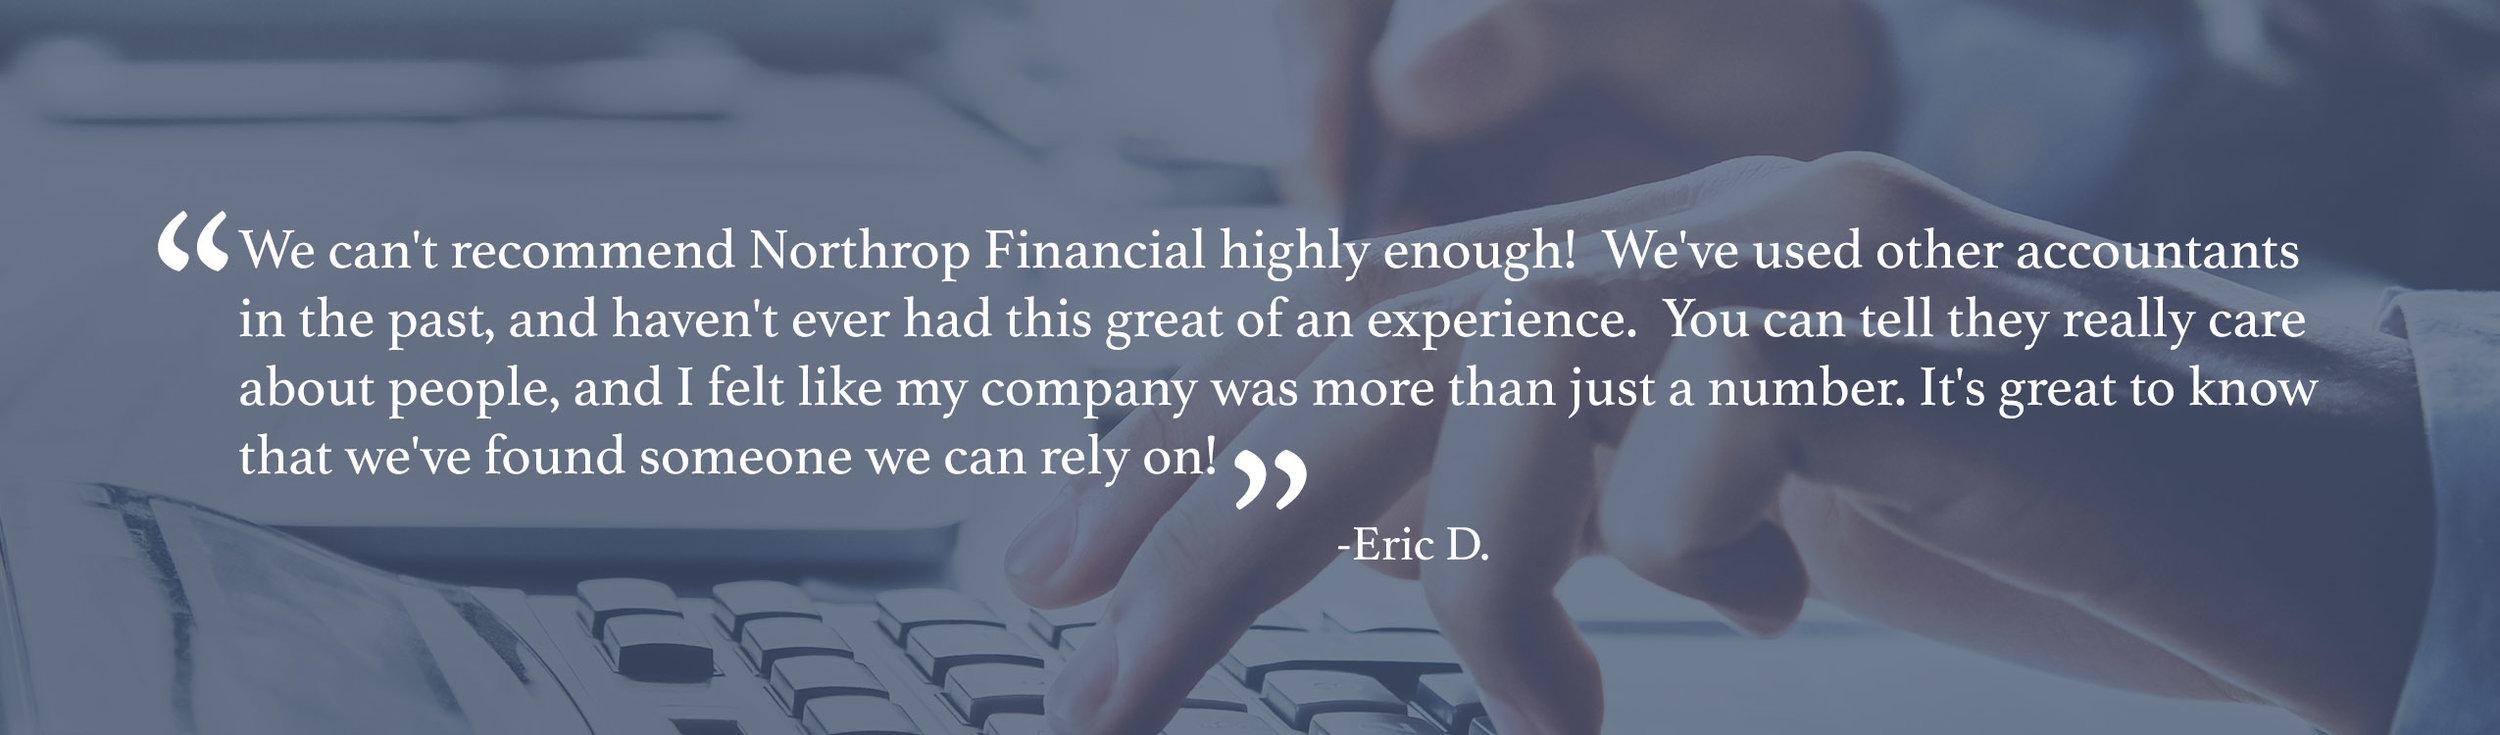 Eric D Testimonial.jpg